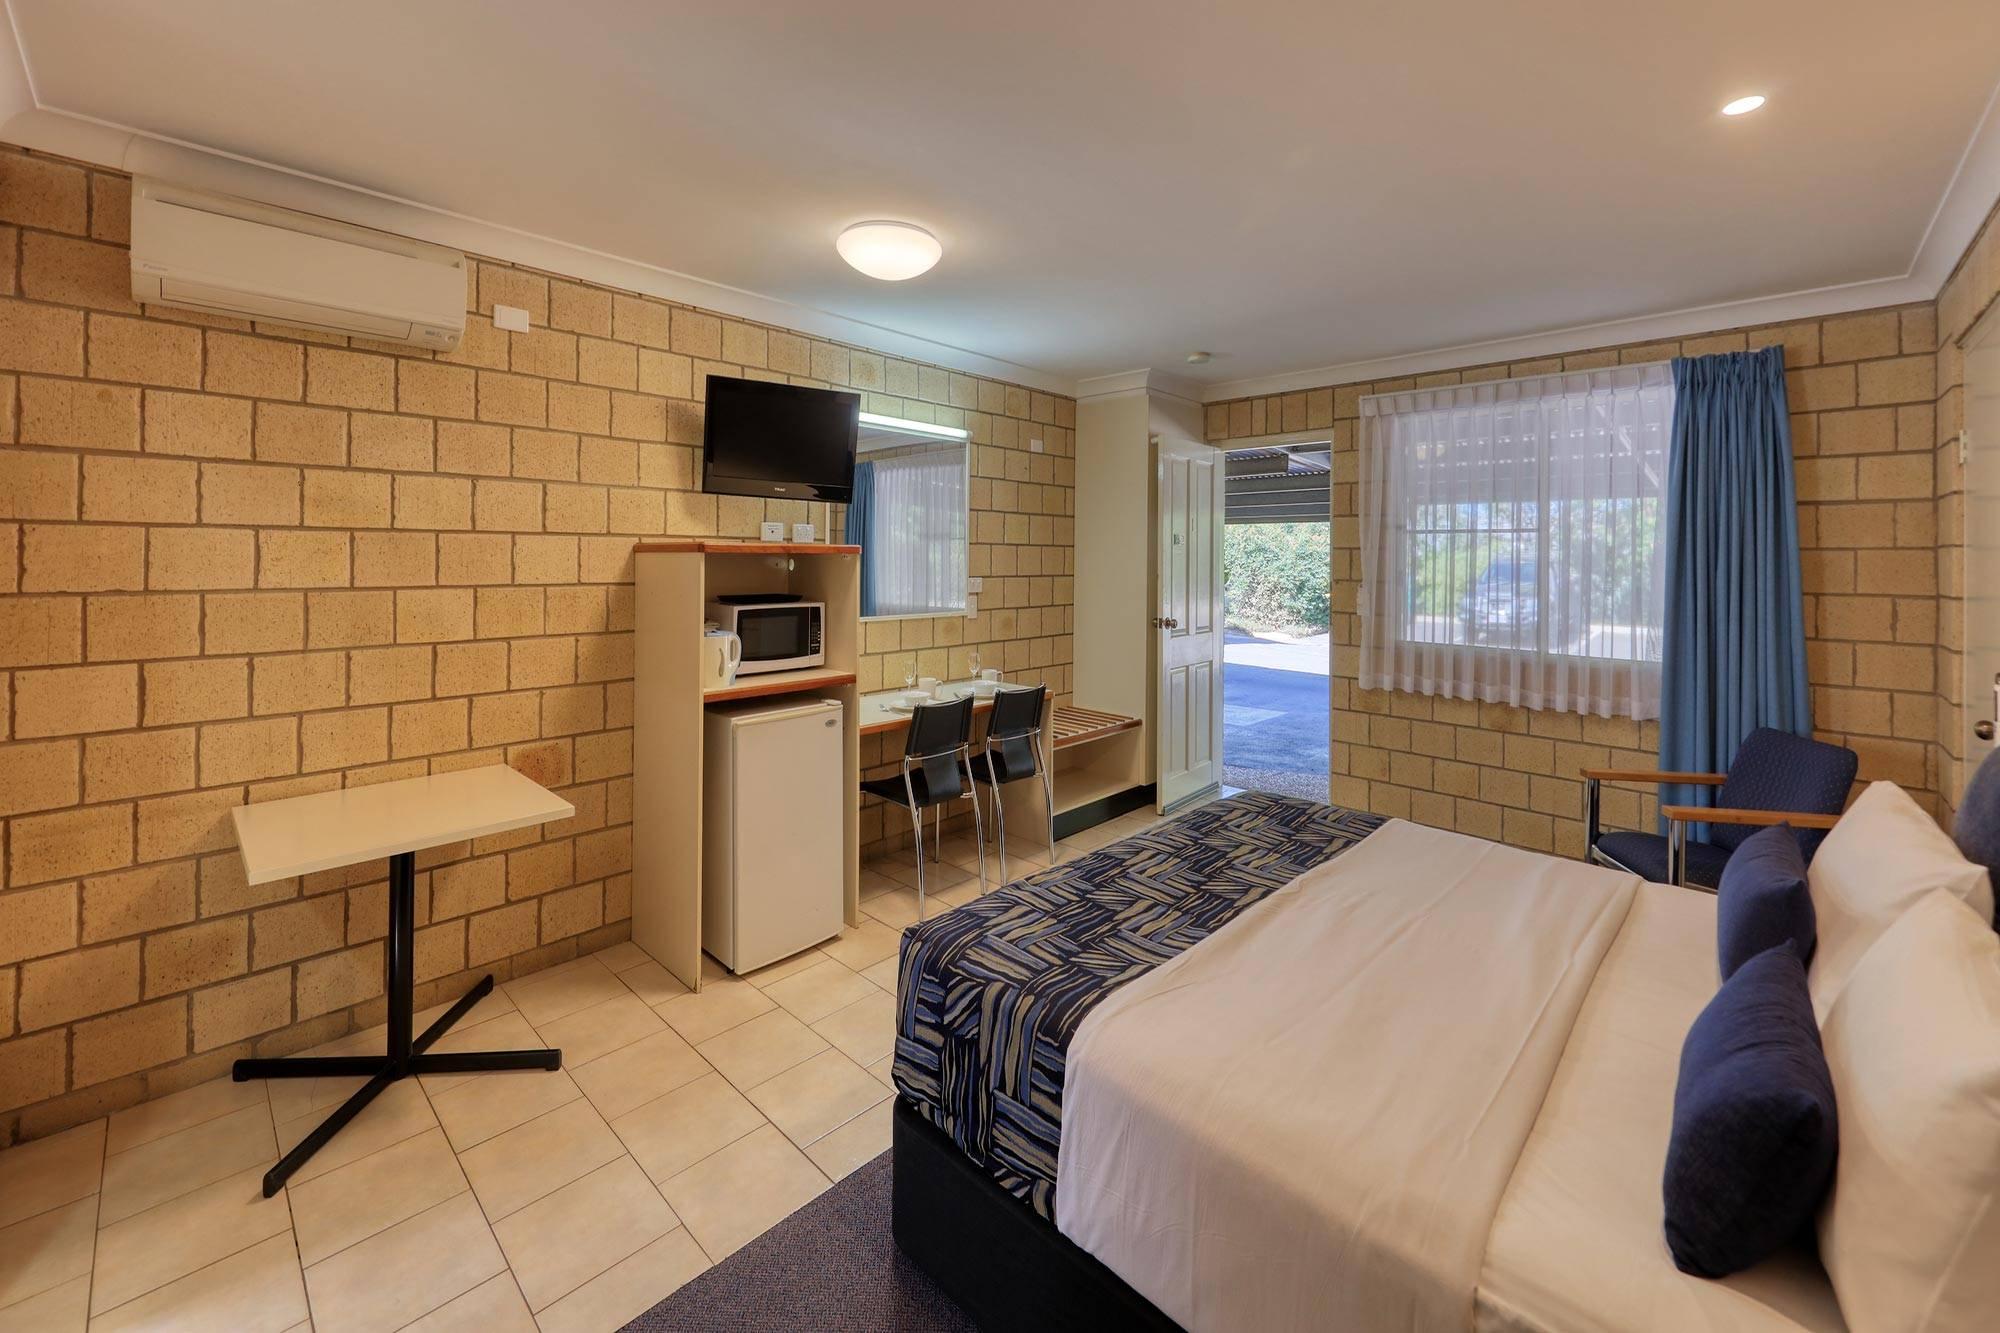 st-george-motel-disabled-king-room (2)